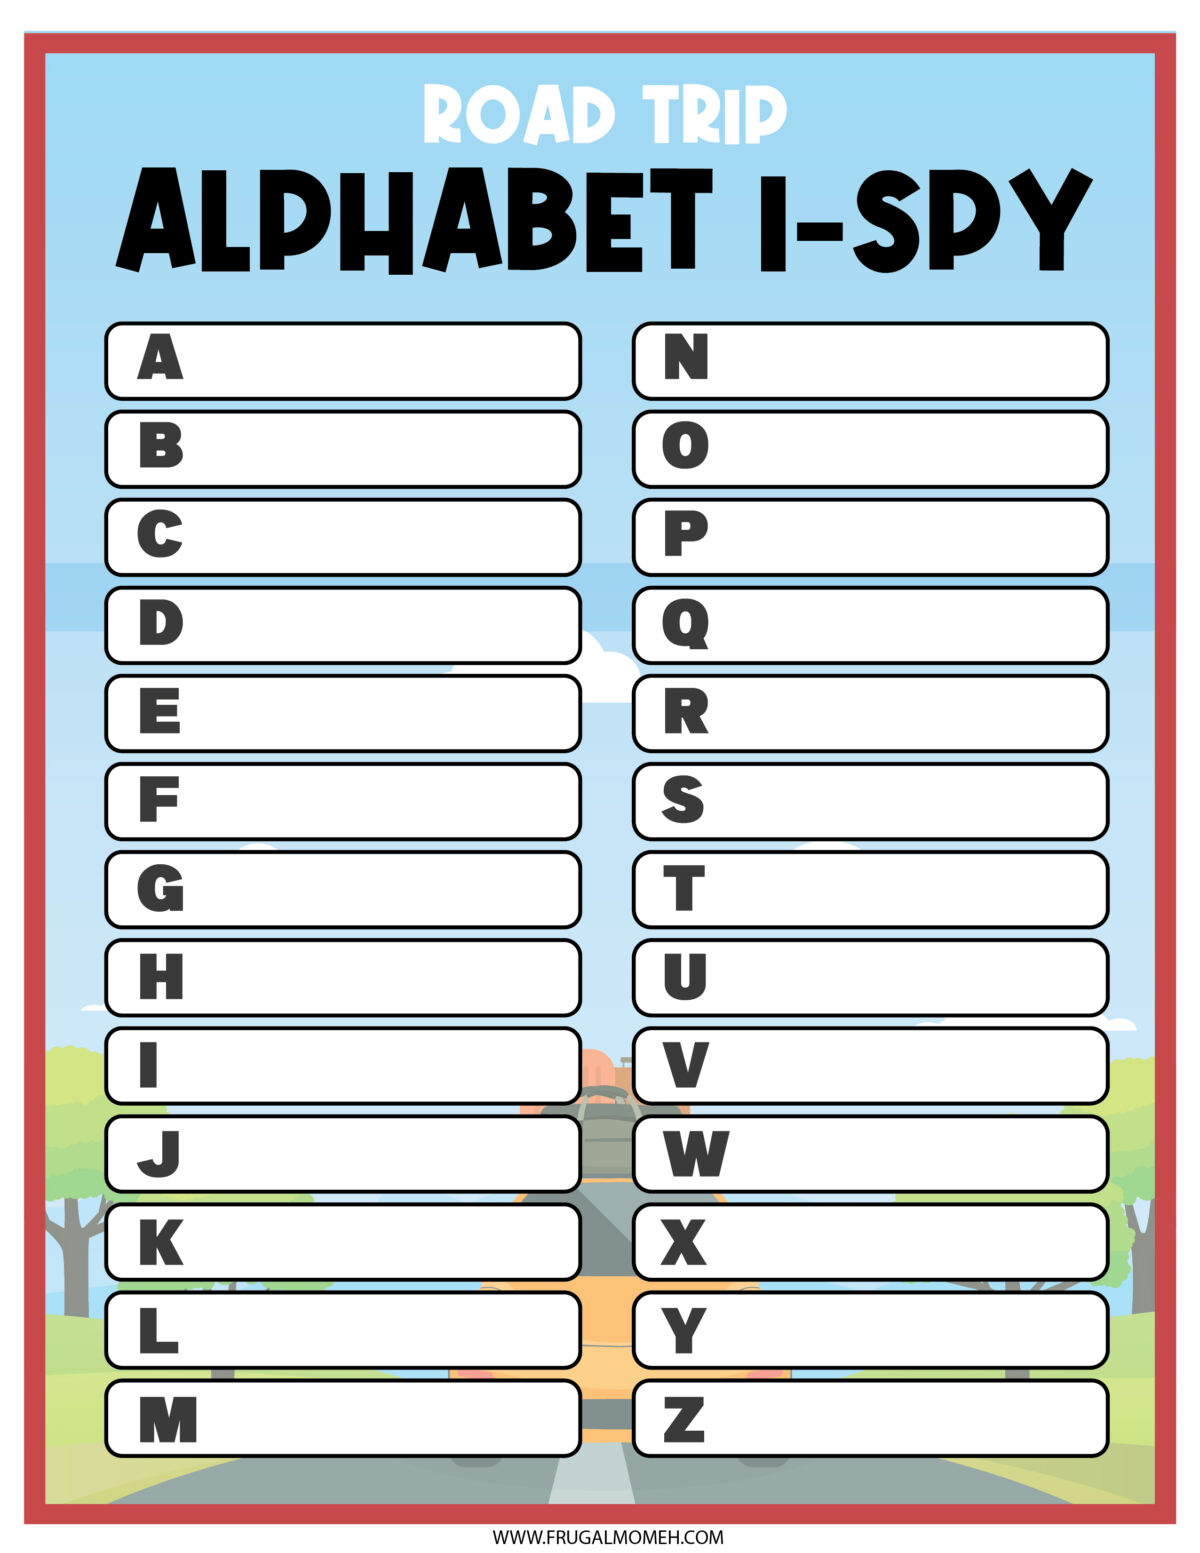 Road Trip Alphabet I-Spy  Printable Sheet